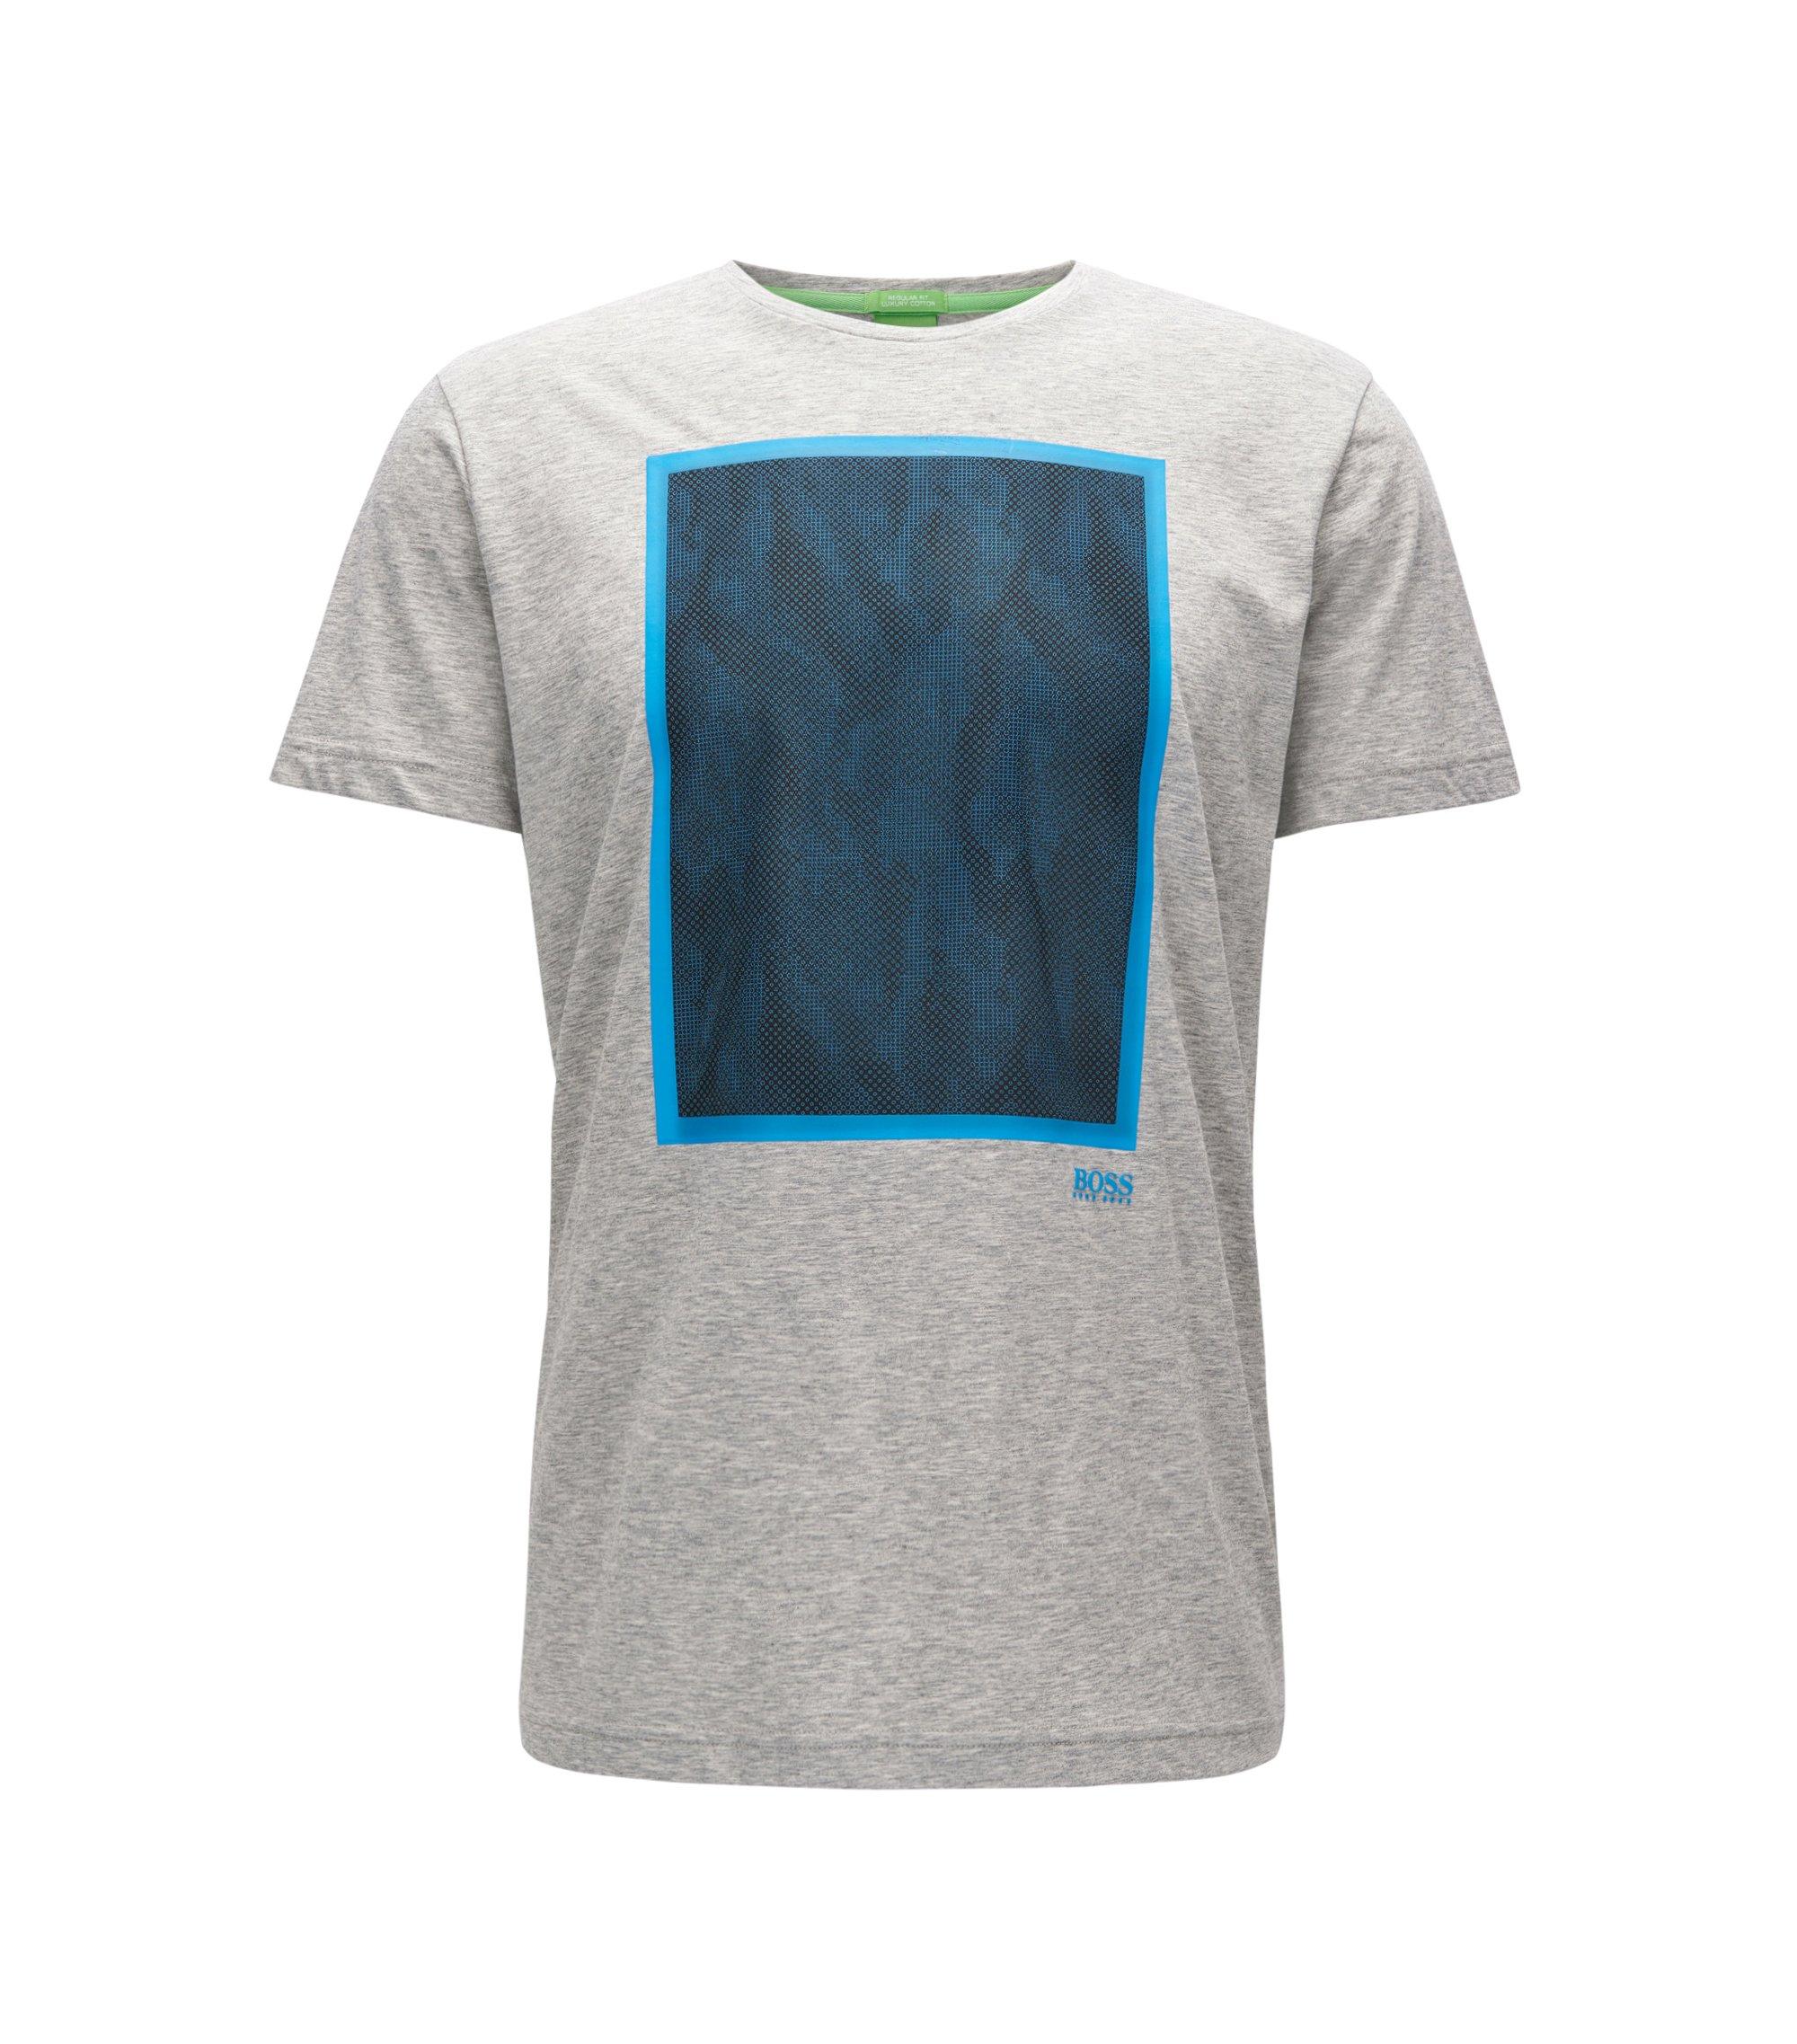 Mesh-Print Cotton Graphic T-Shirt | Tee, Light Grey